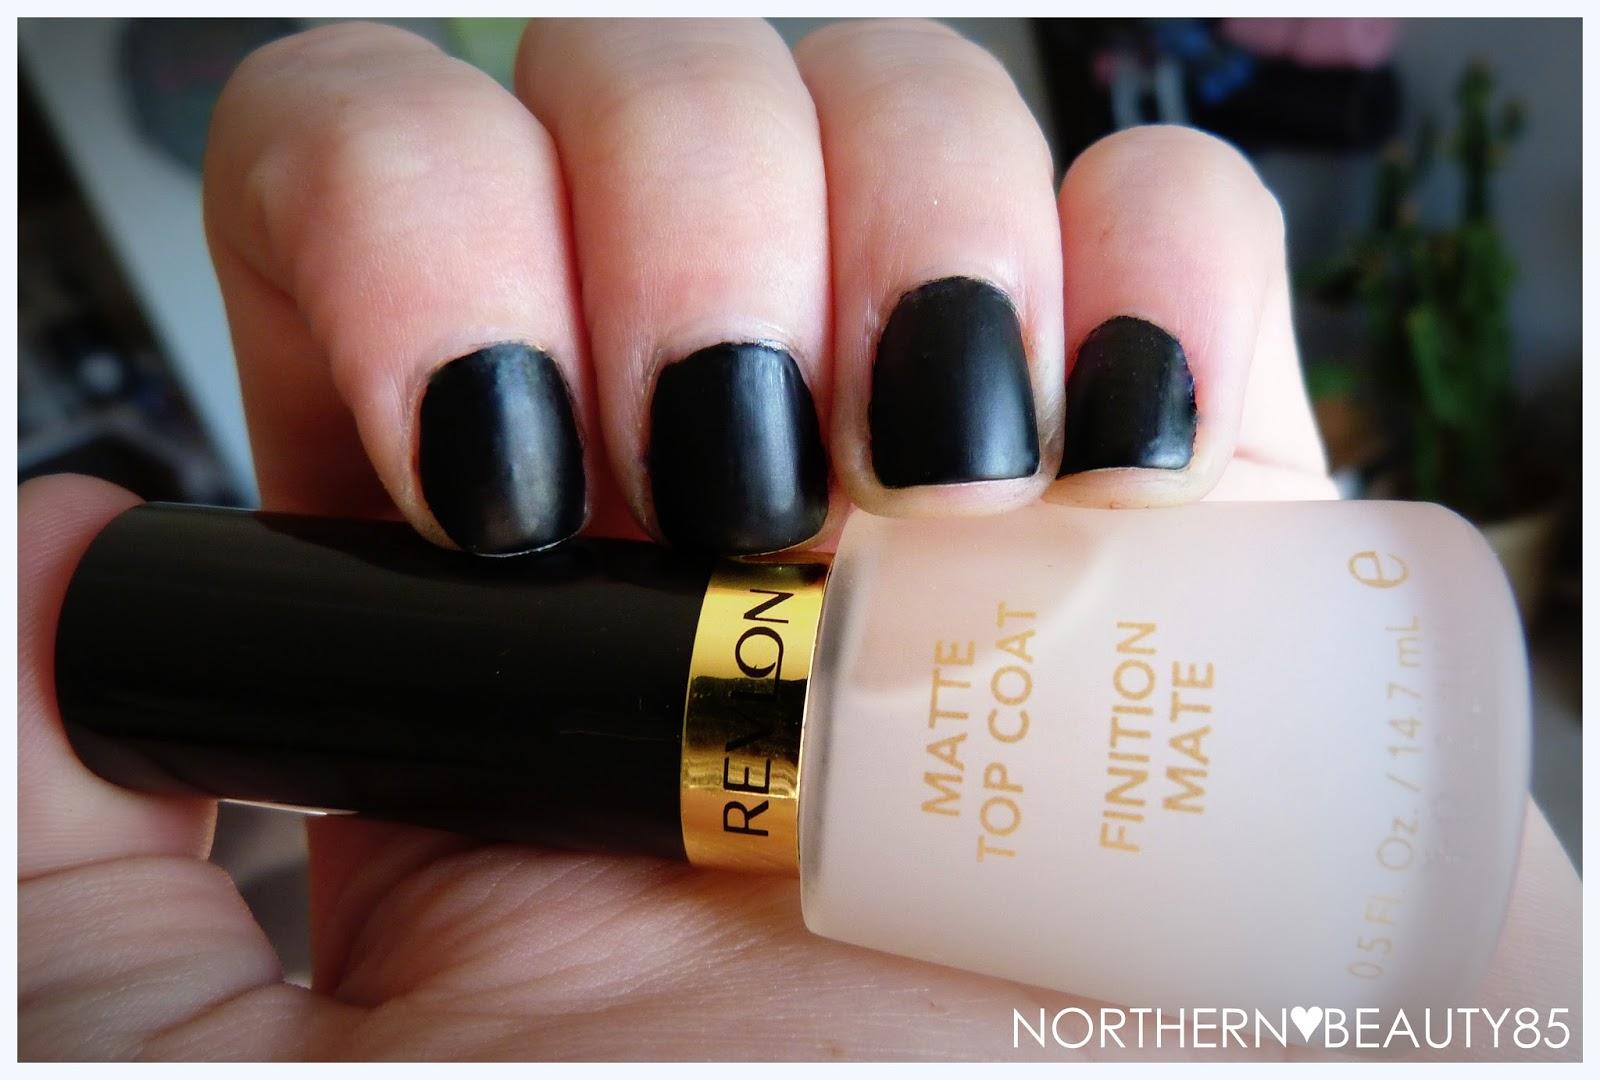 Northern Beauty Nail Of The Week Revlon S Matte Top Coat